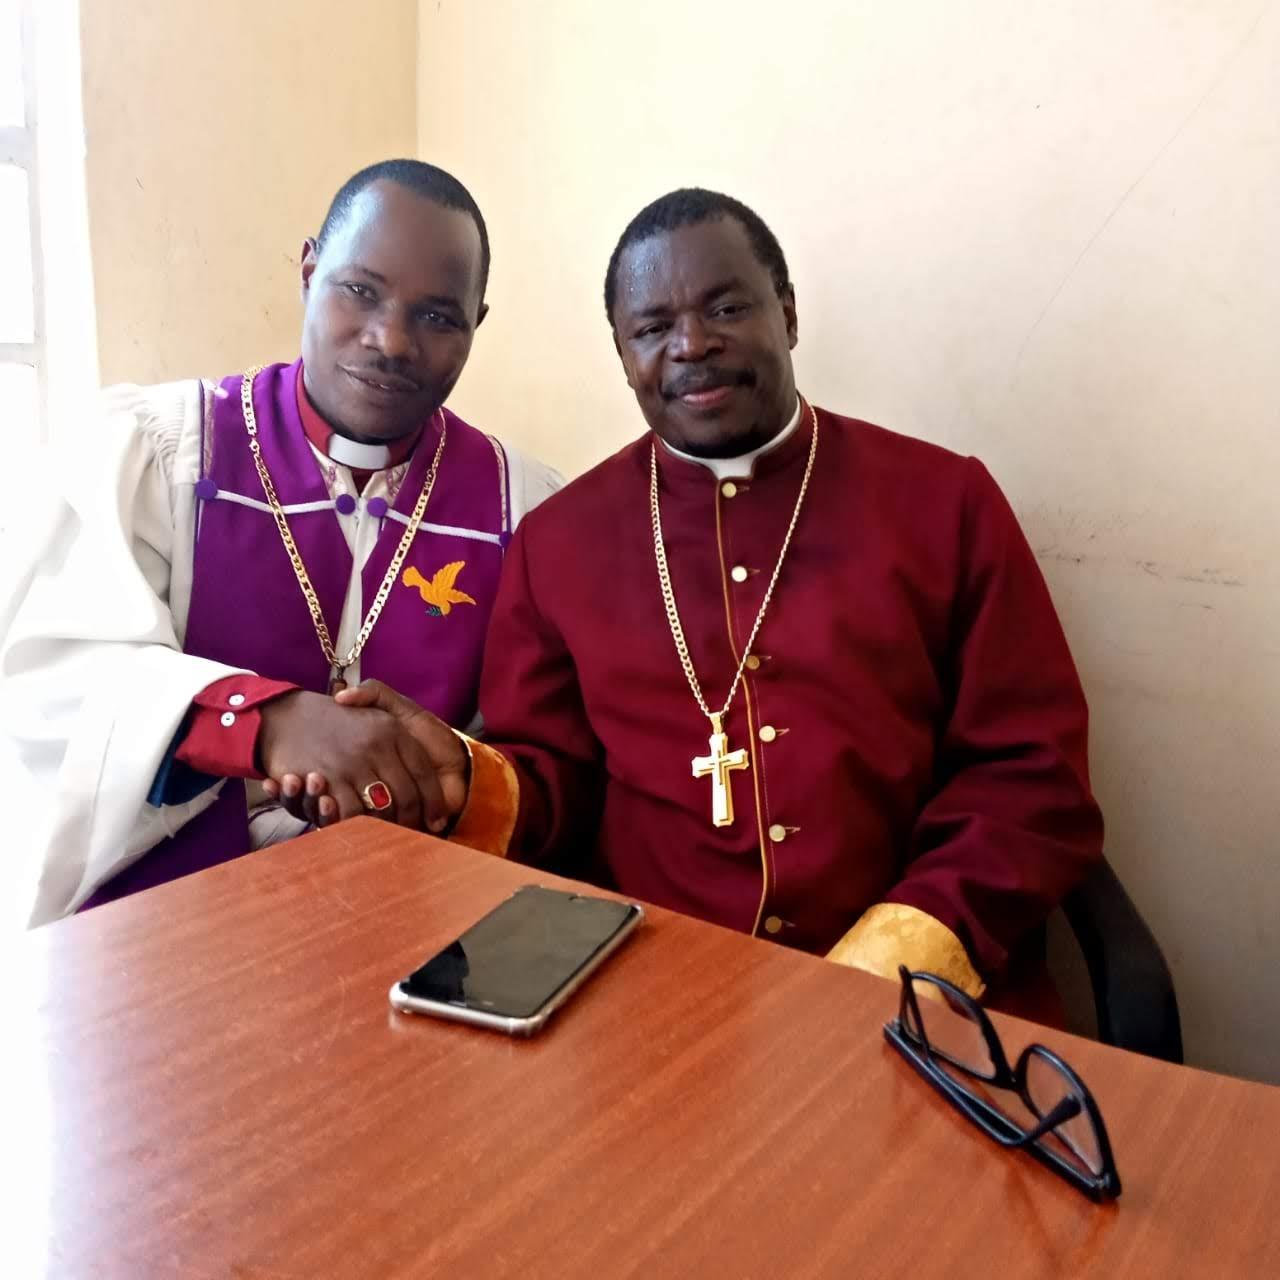 Bishop Muli in consultative meeting with Bishop Jonah obonyo of Praise cathedral ministry